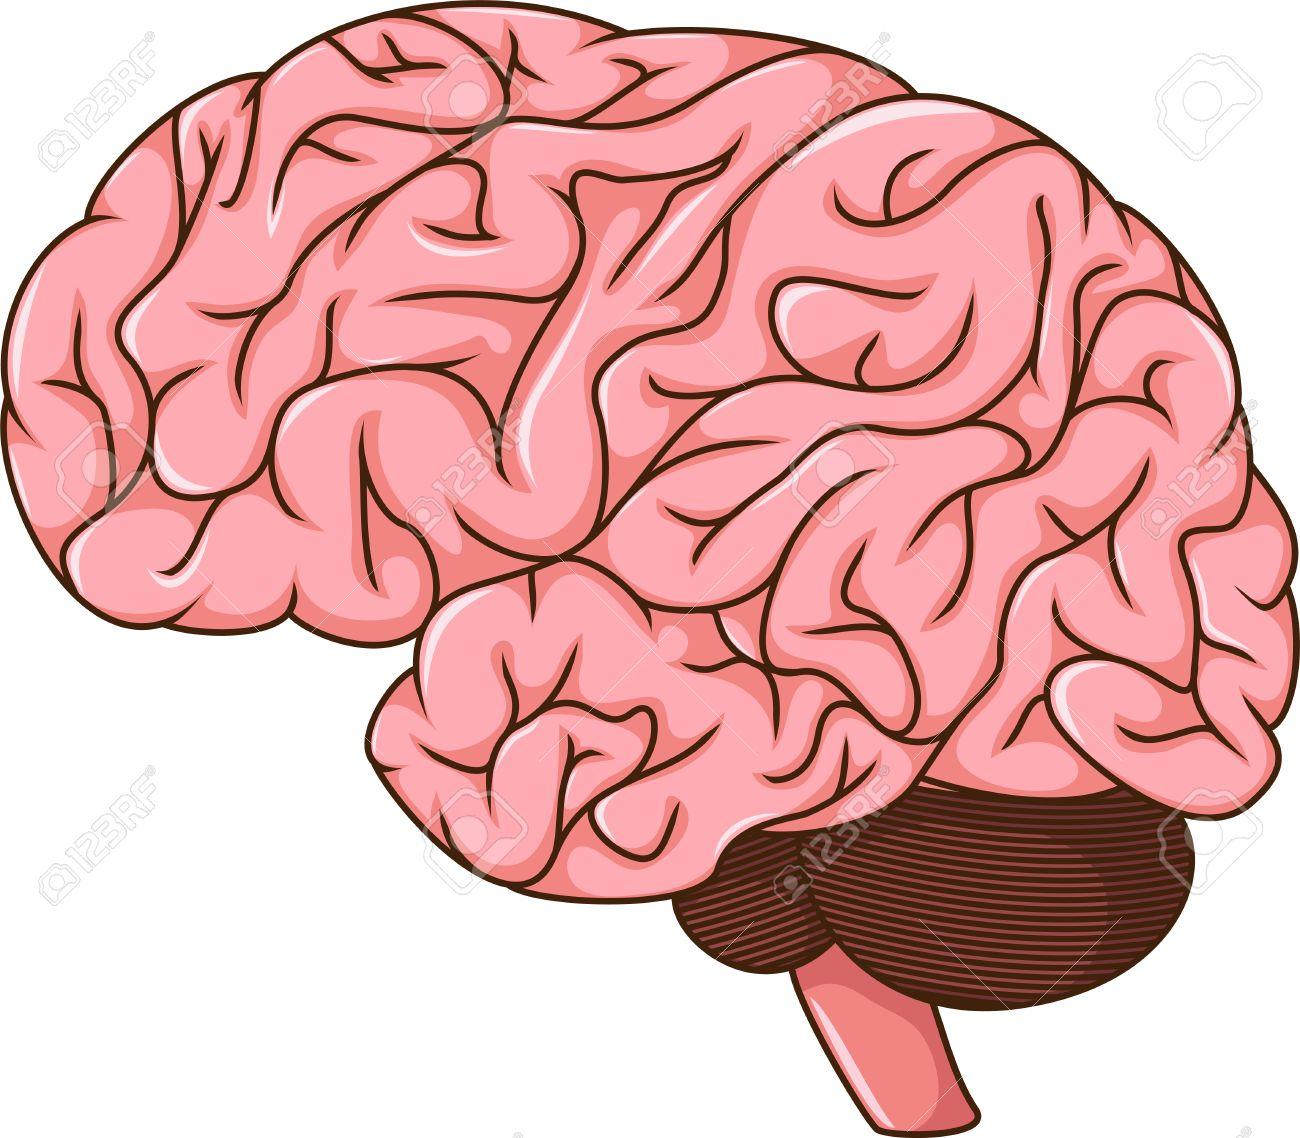 human brain cartoon royalty free cliparts vectors and stock rh 123rf com cartoon brain pics Easy Cartoon Brain